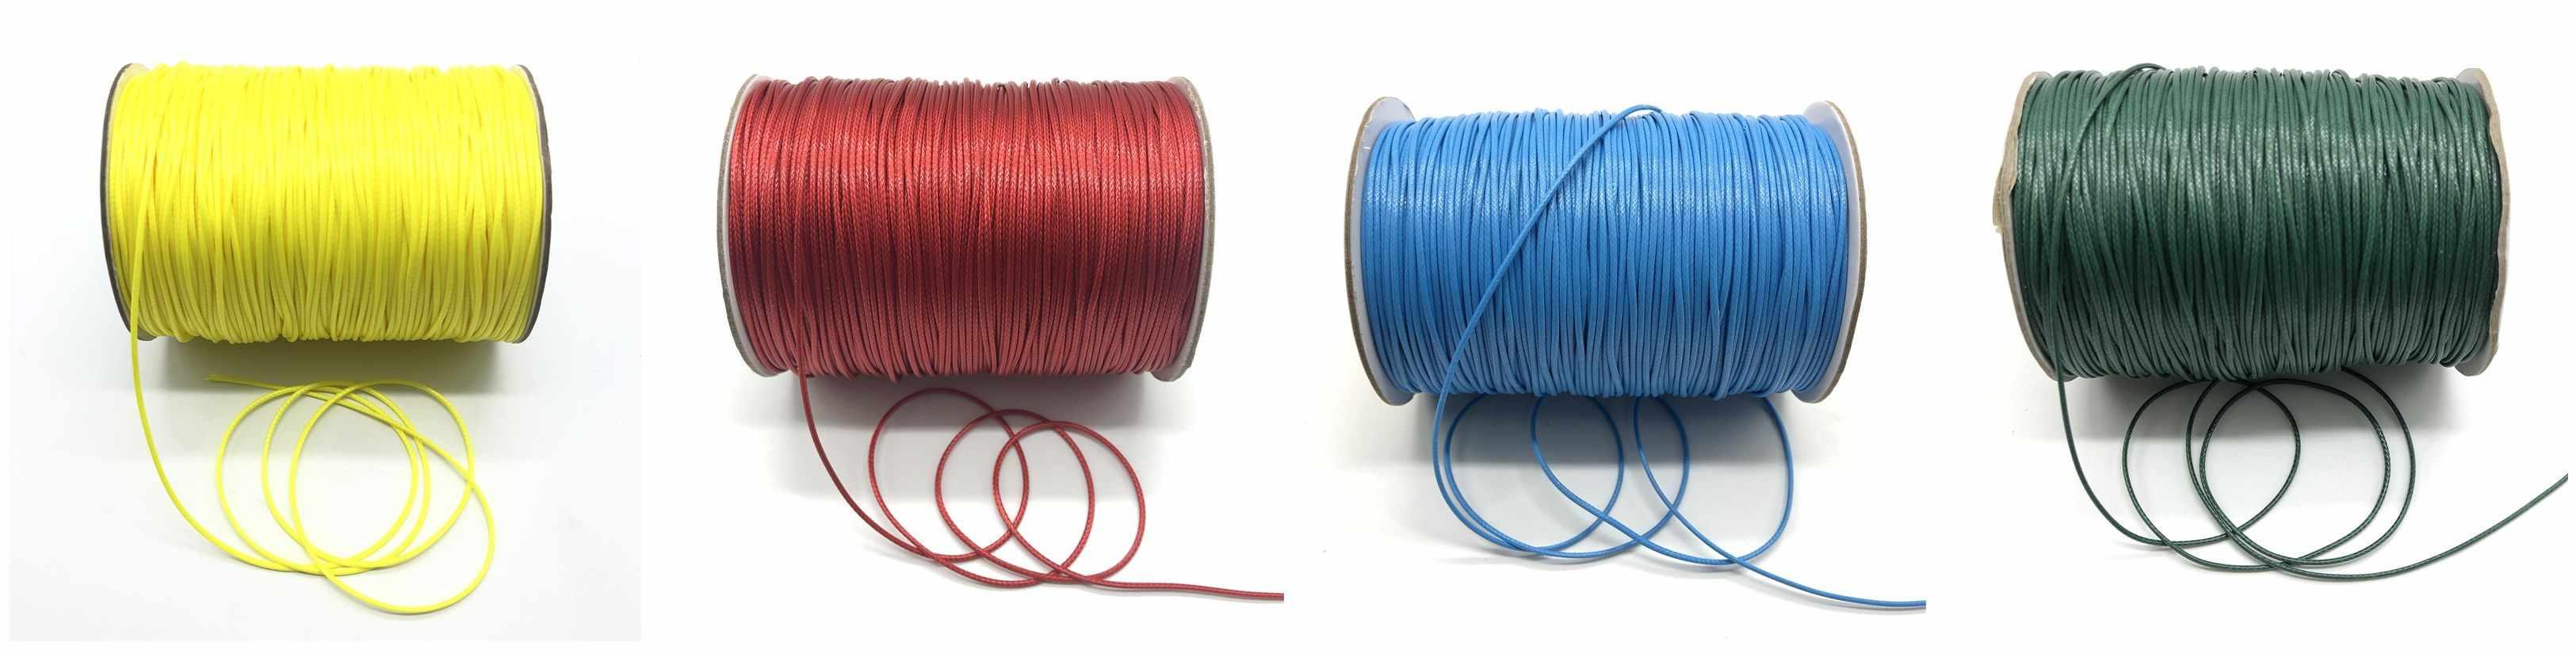 10 Meter/lot 1.0 Mm Wax Tali Benang String Tali Kalung Tali Bead untuk DIY Membuat Perhiasan Gelang Kalung